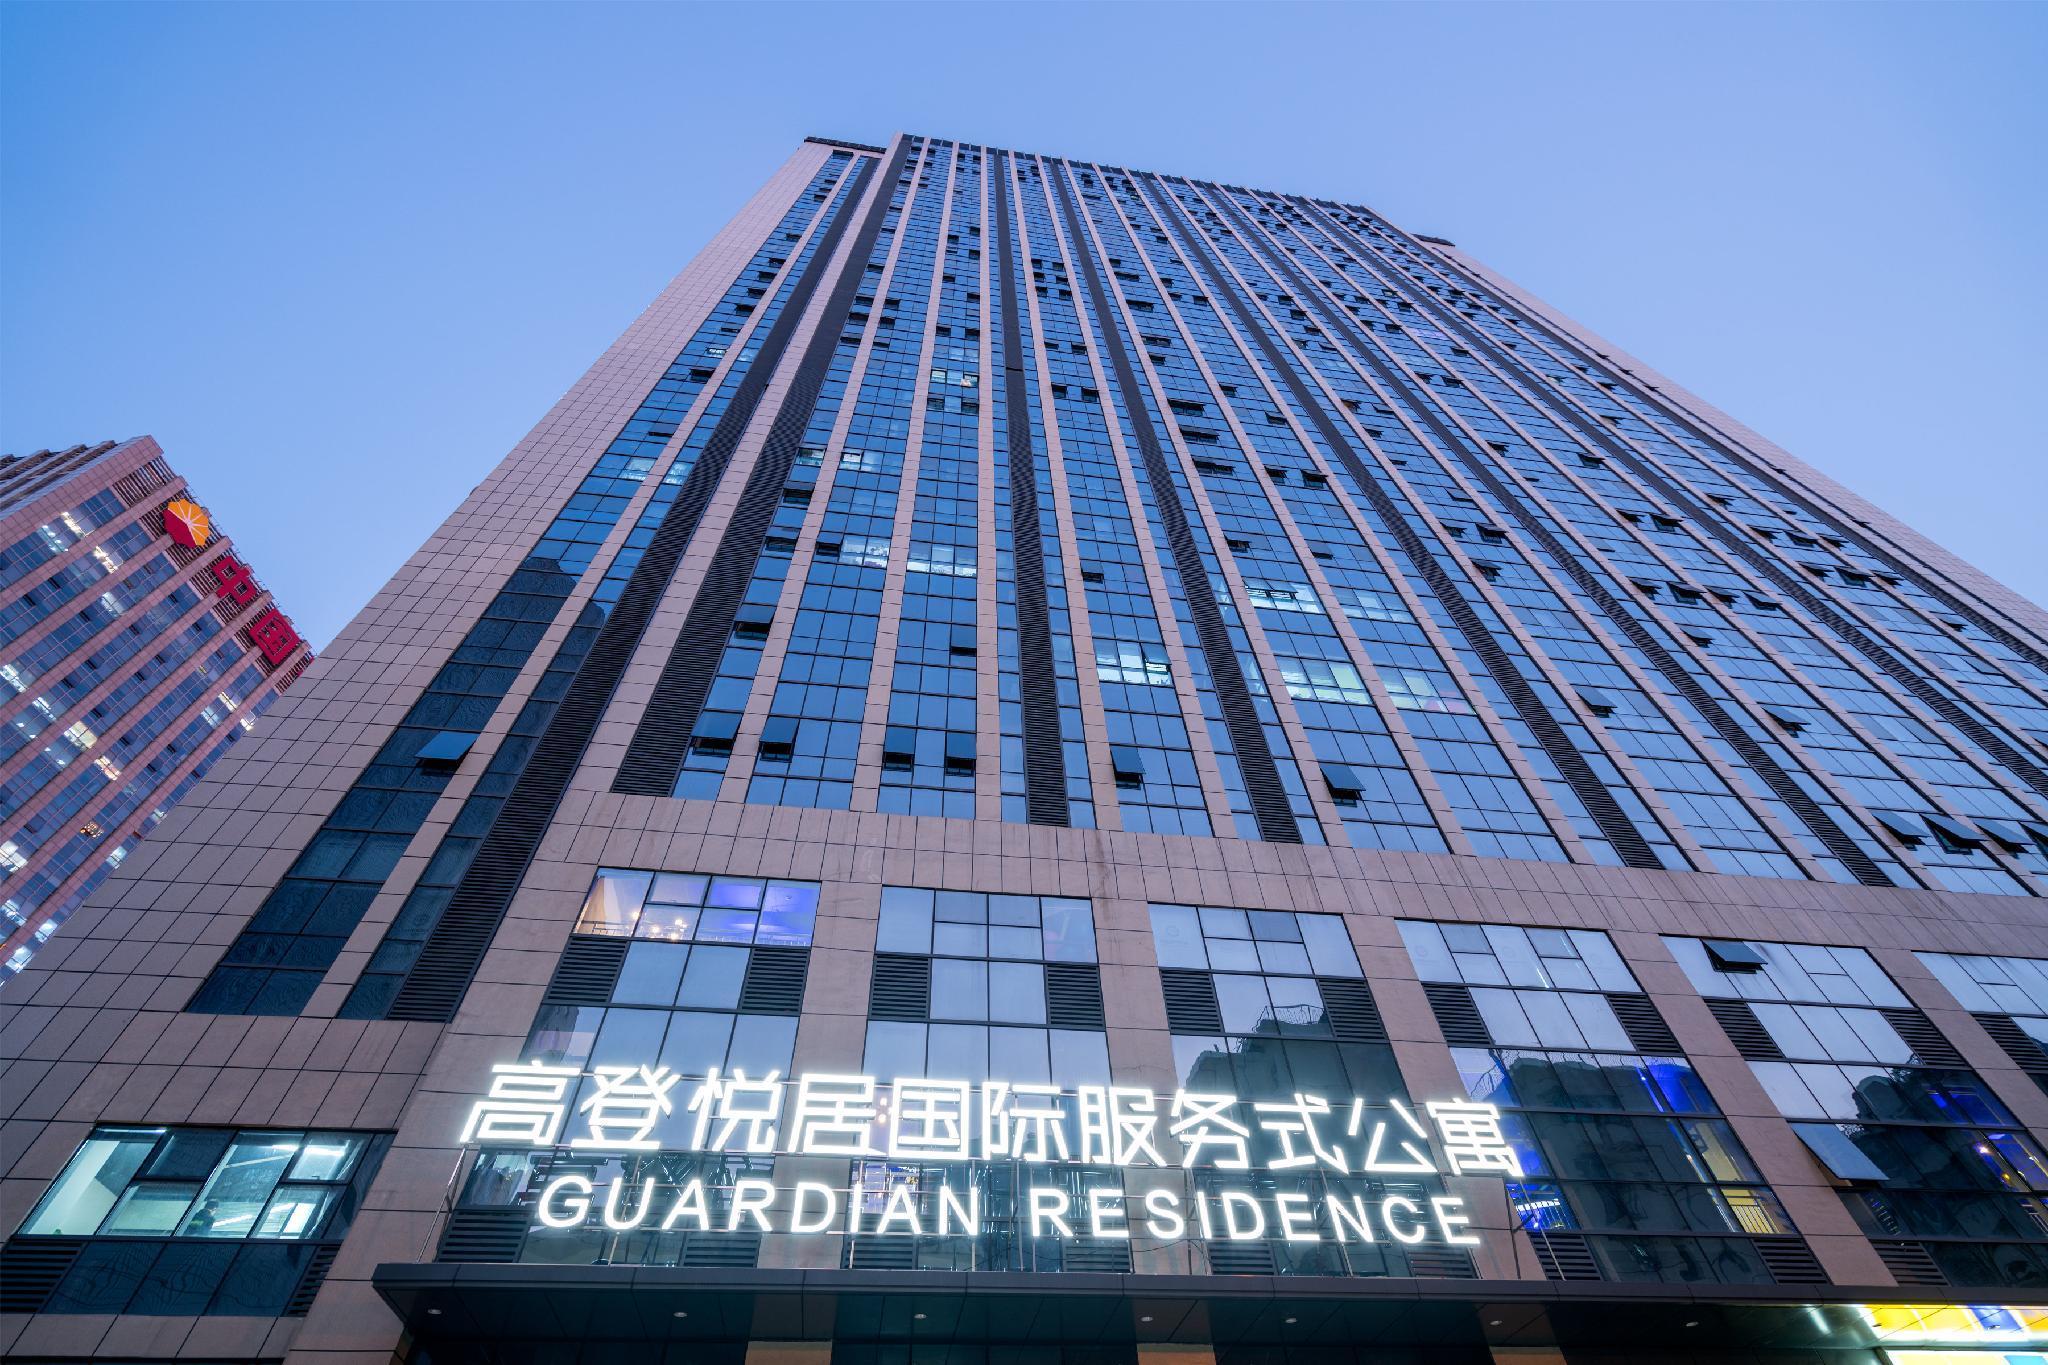 Guardian Residence